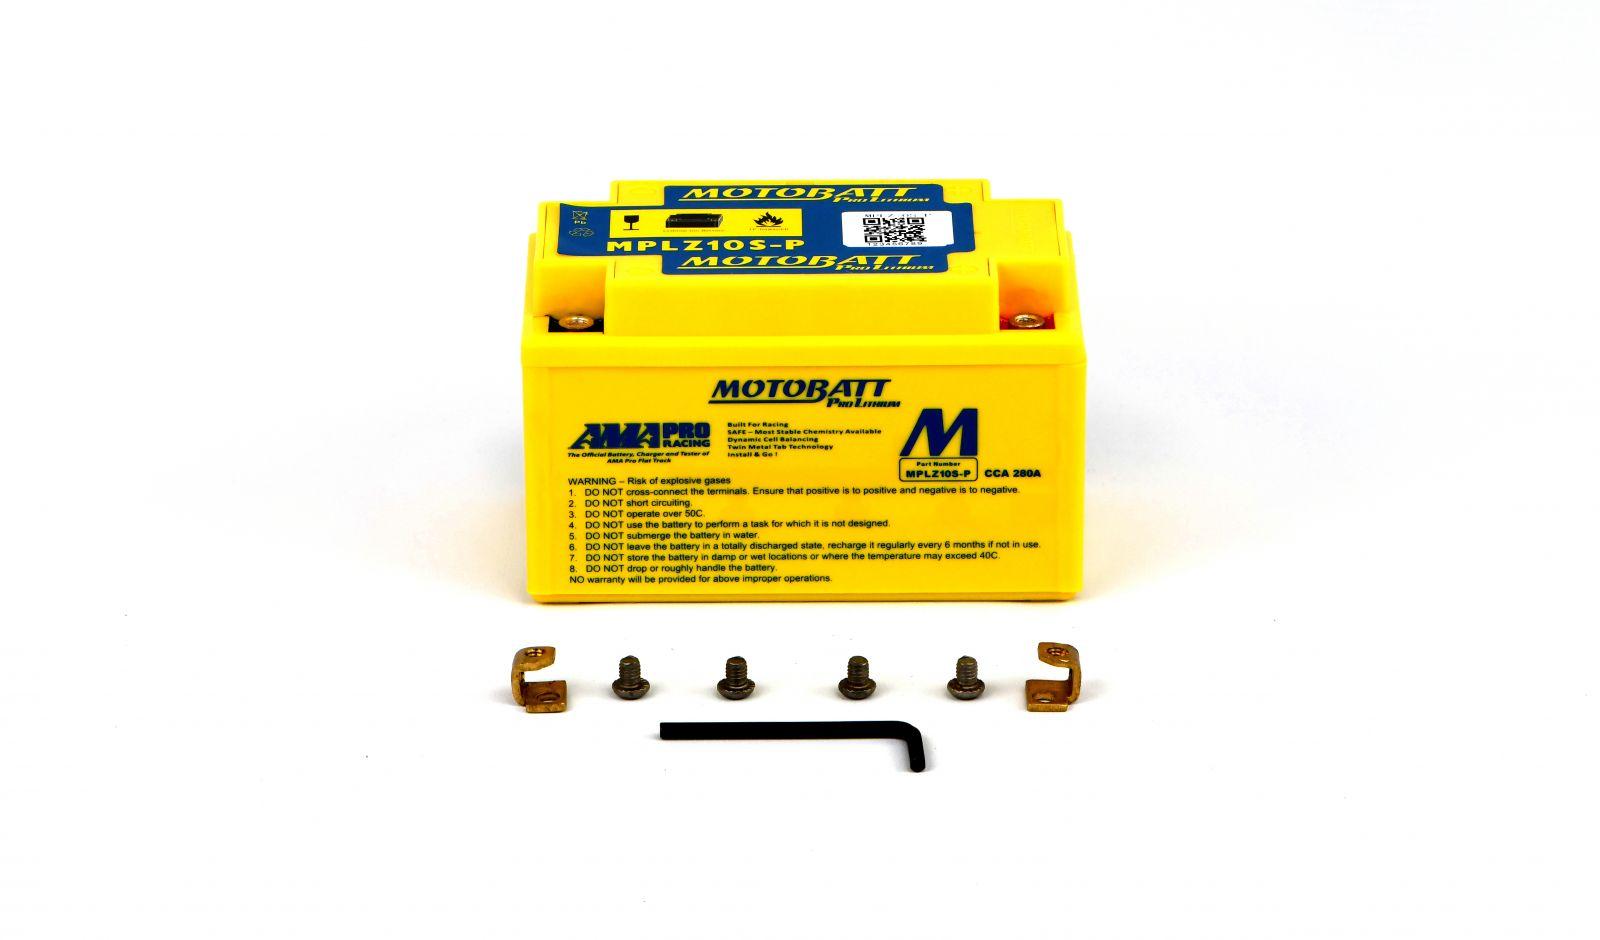 Motobatt Lithium Batteries - 501107ML image